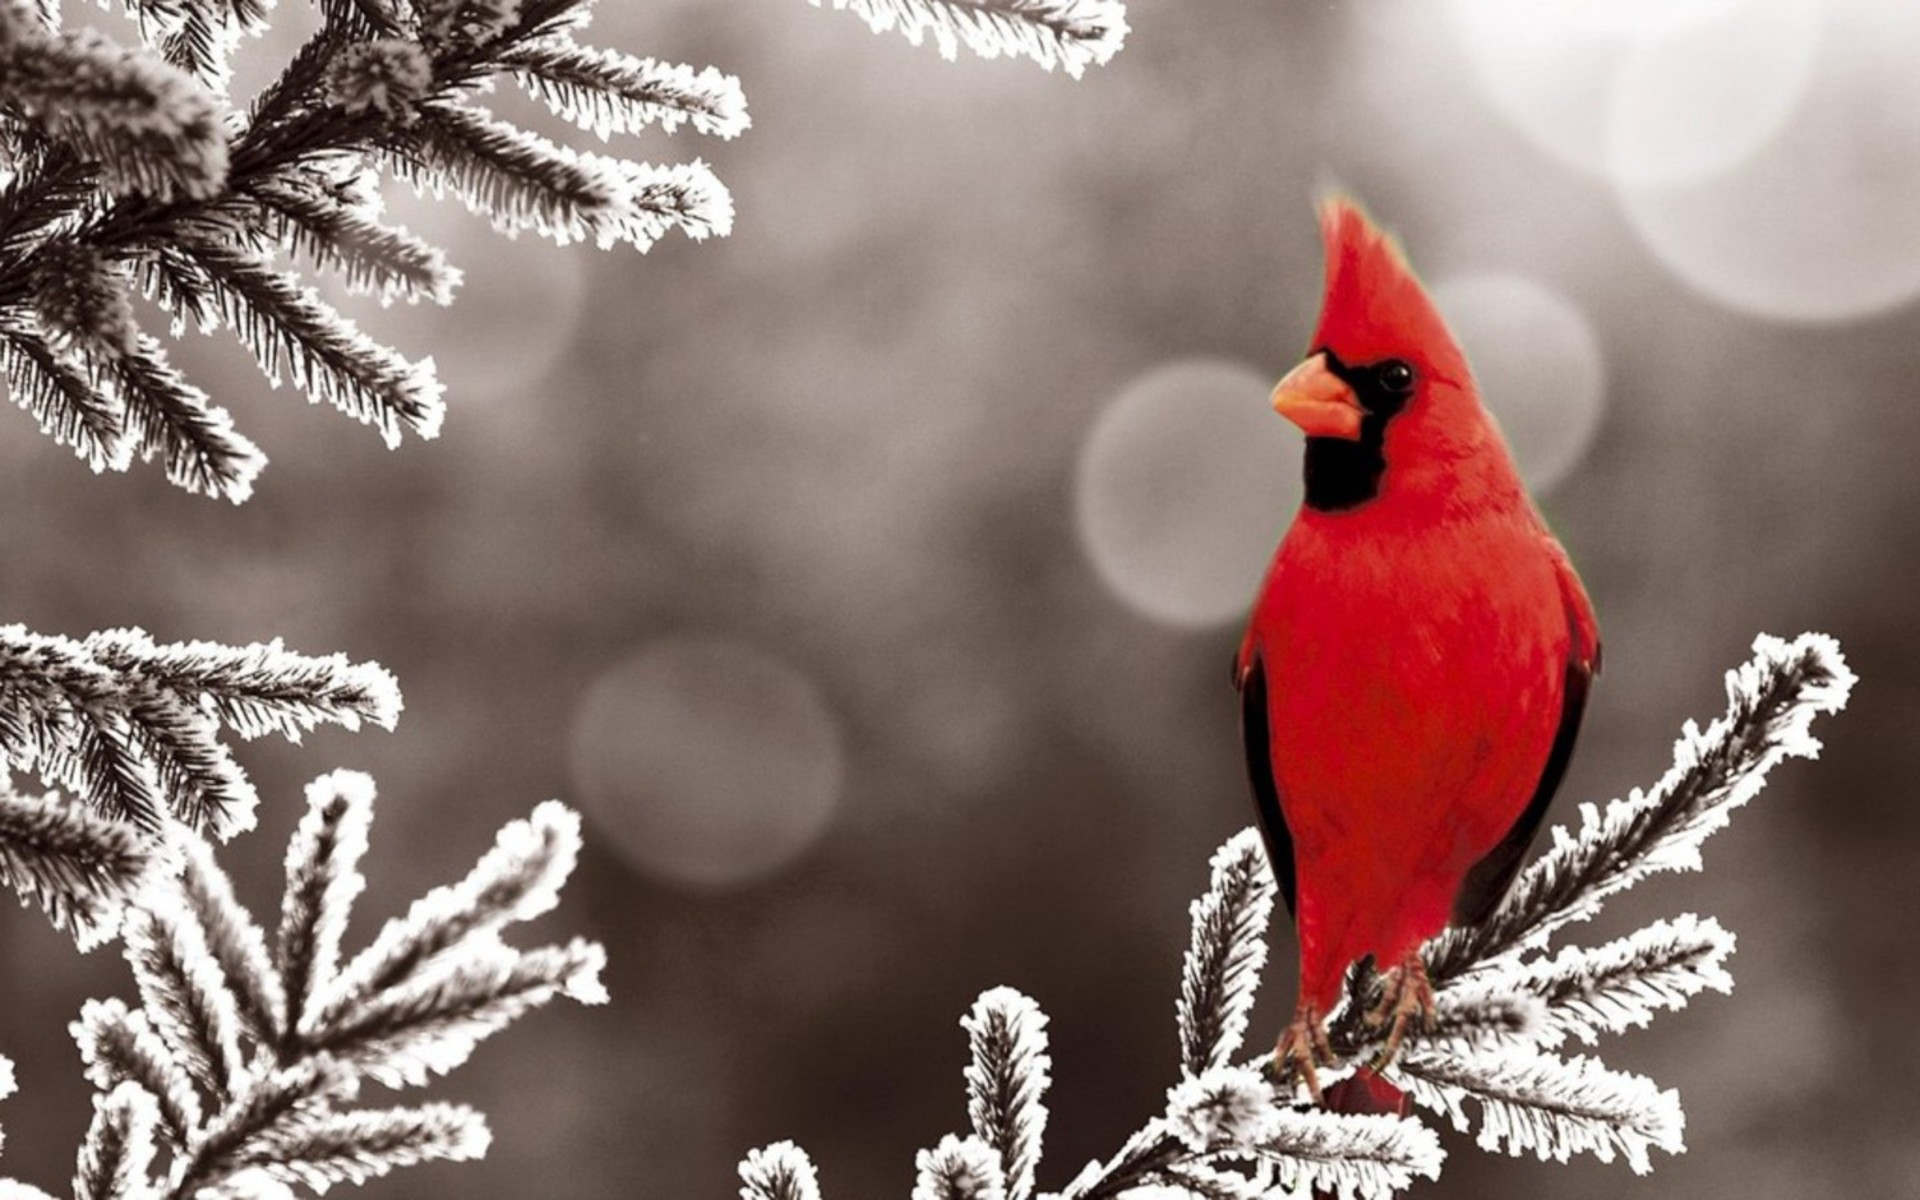 Res: 1920x1200, Red Bird Wallpaper - Download Wallpaper